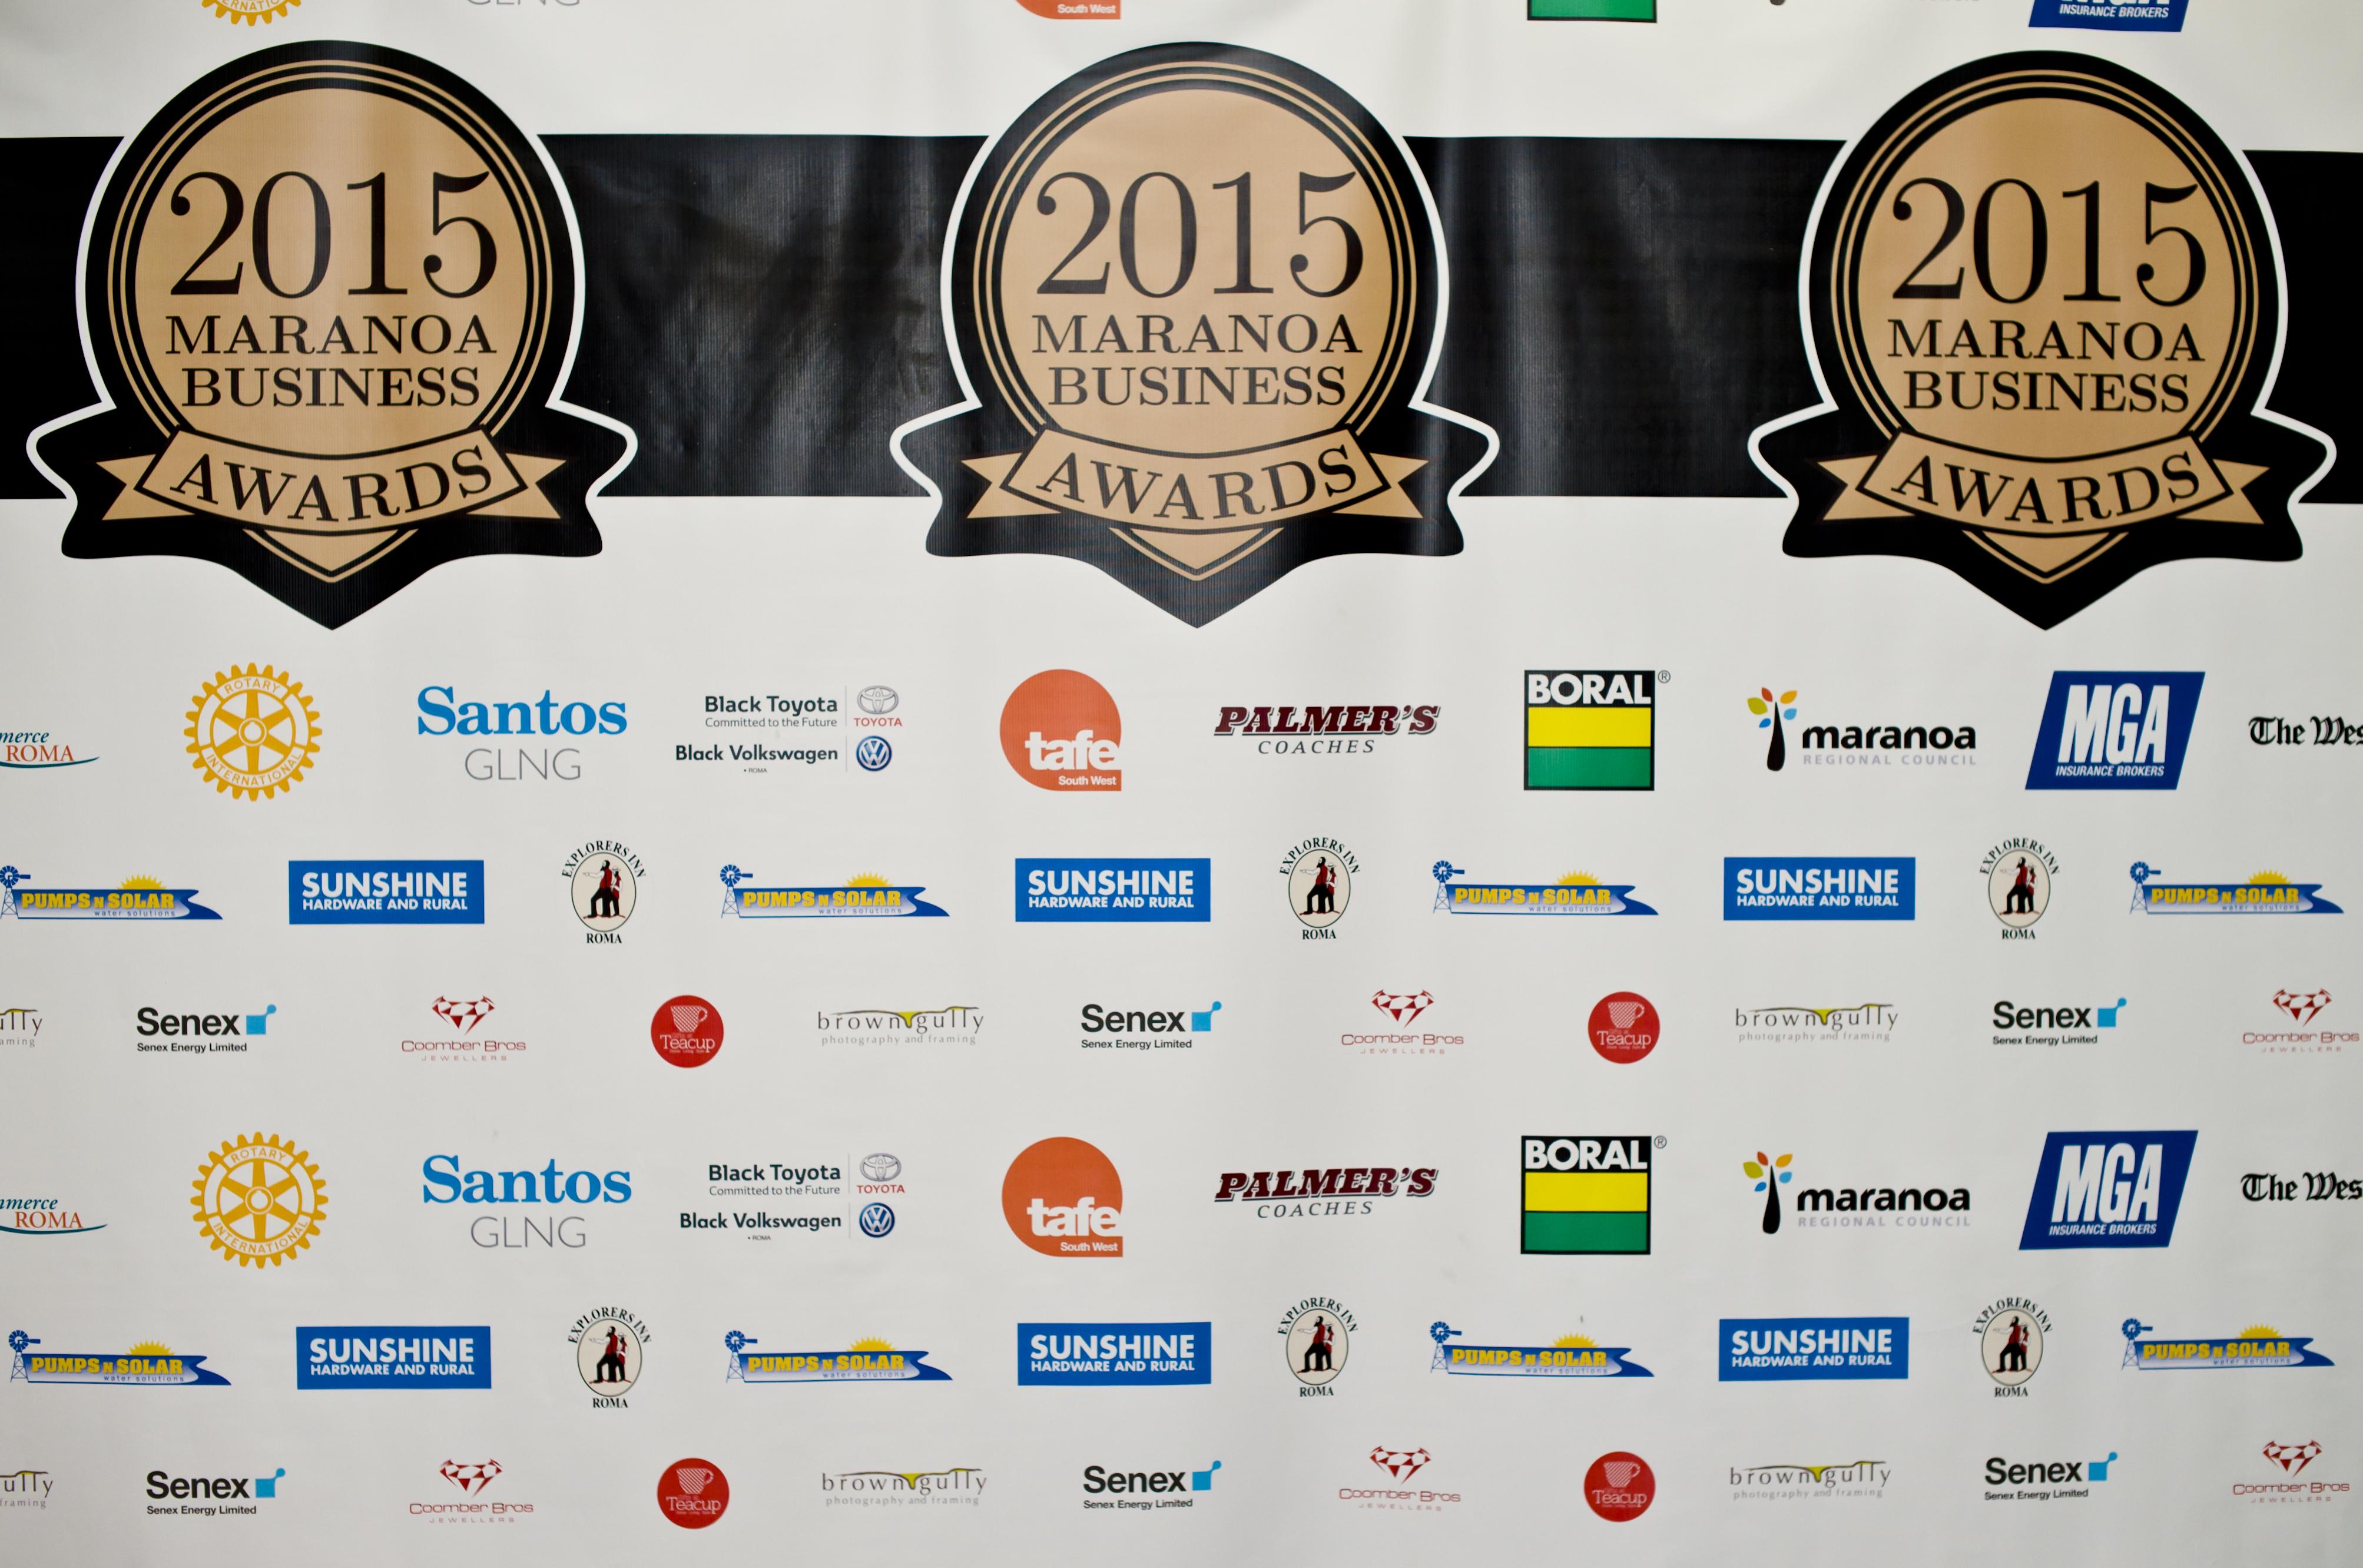 002_Maranoa Bus Awards - Copy